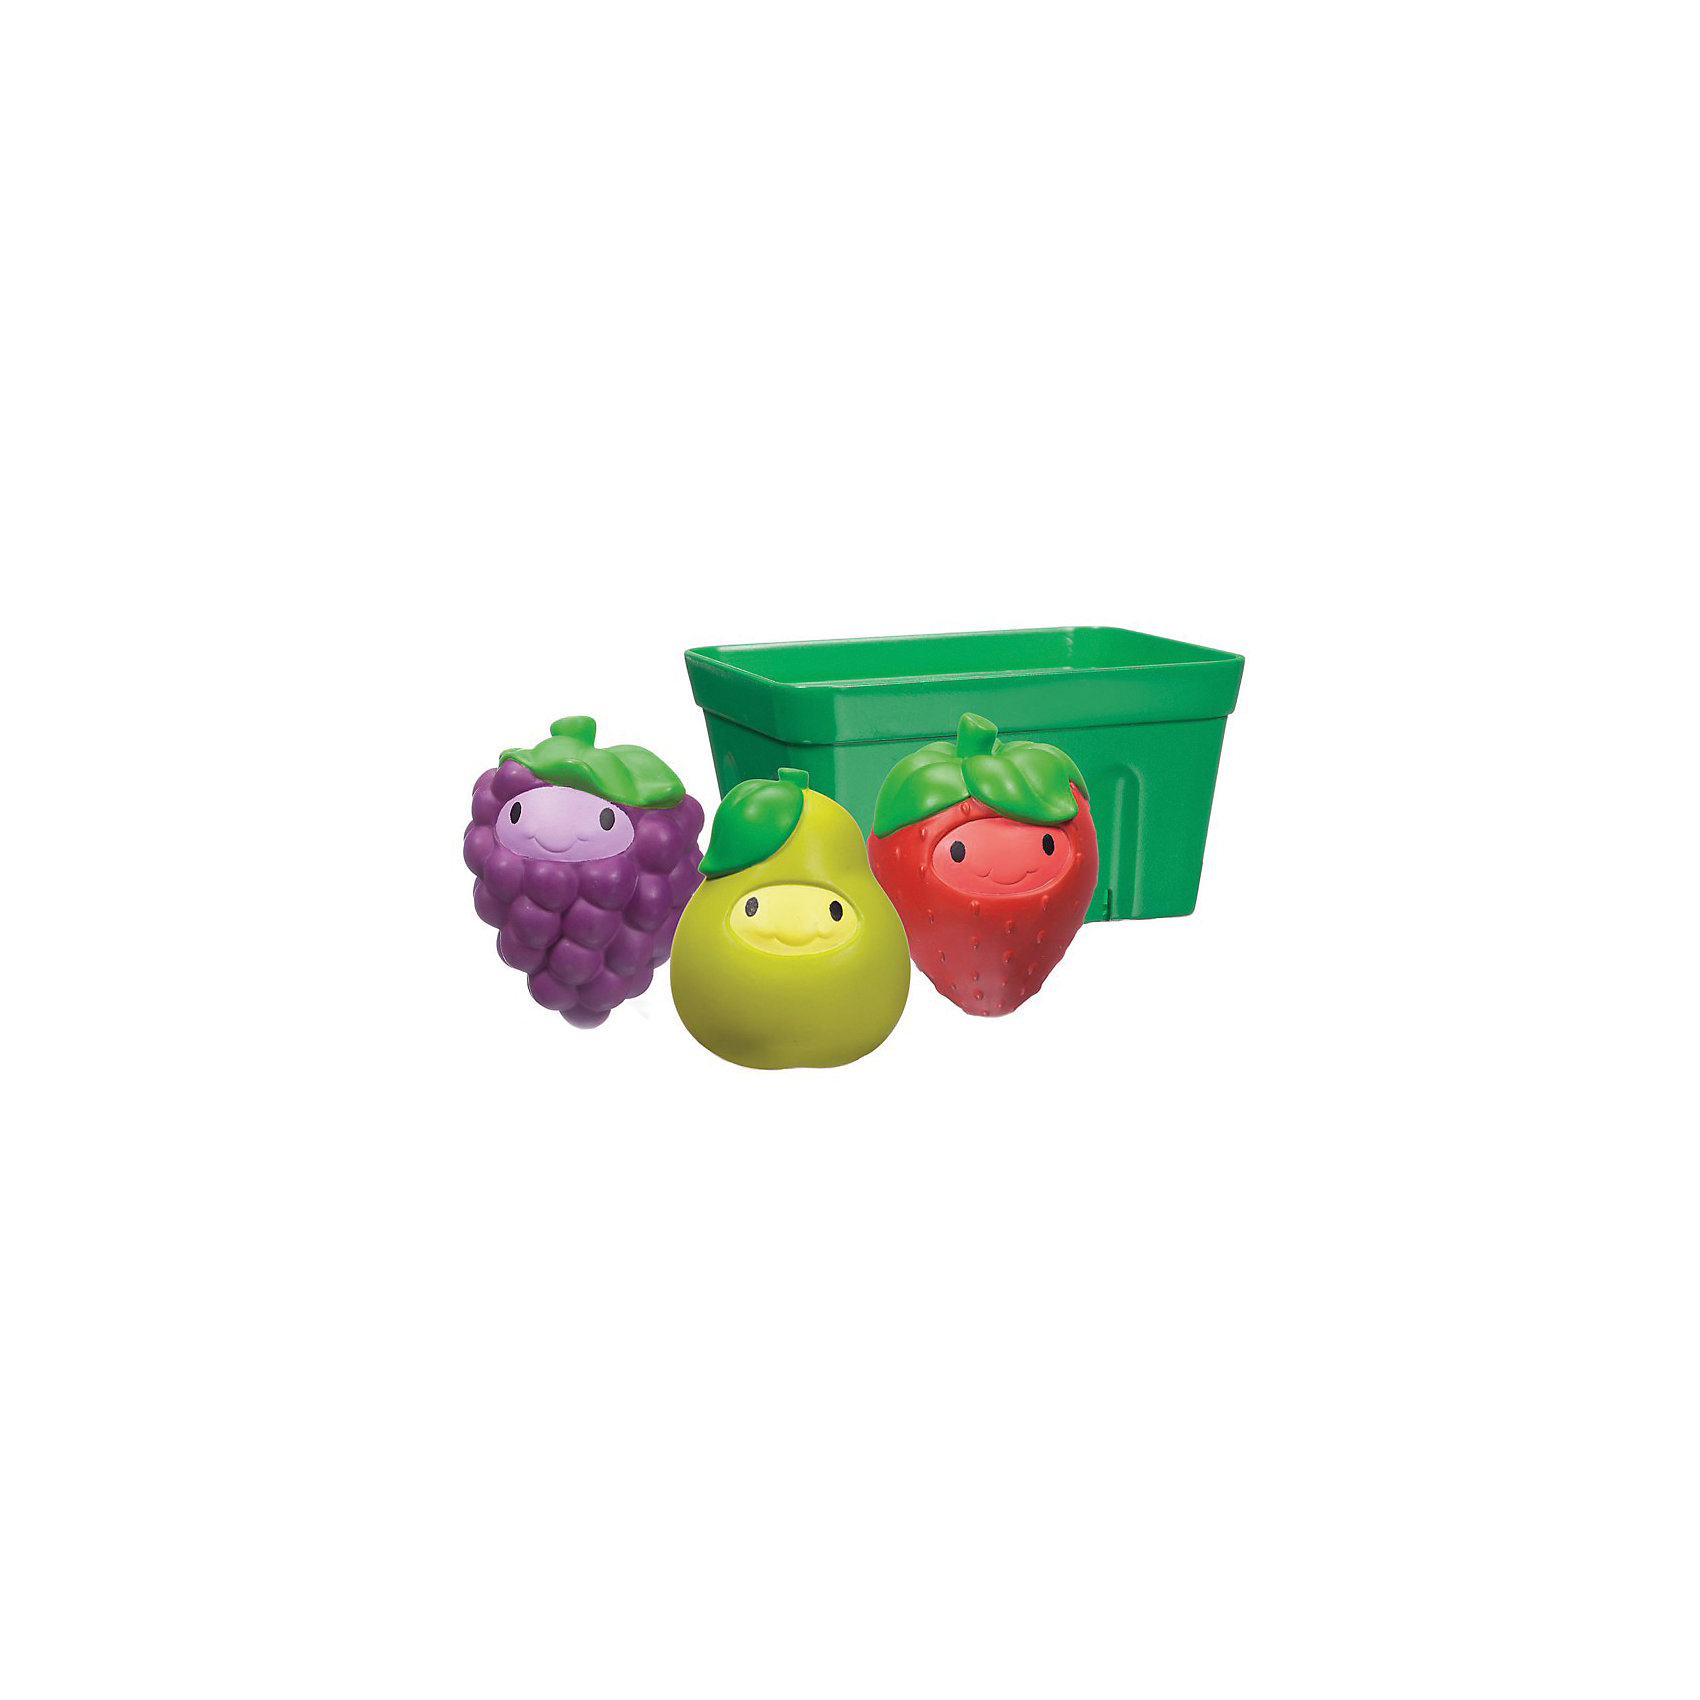 munchkin Игрушки для ванны Фрукты в корзине 9+, Munchkin игрушки для ванны munchkin игрушки для ванны ферма